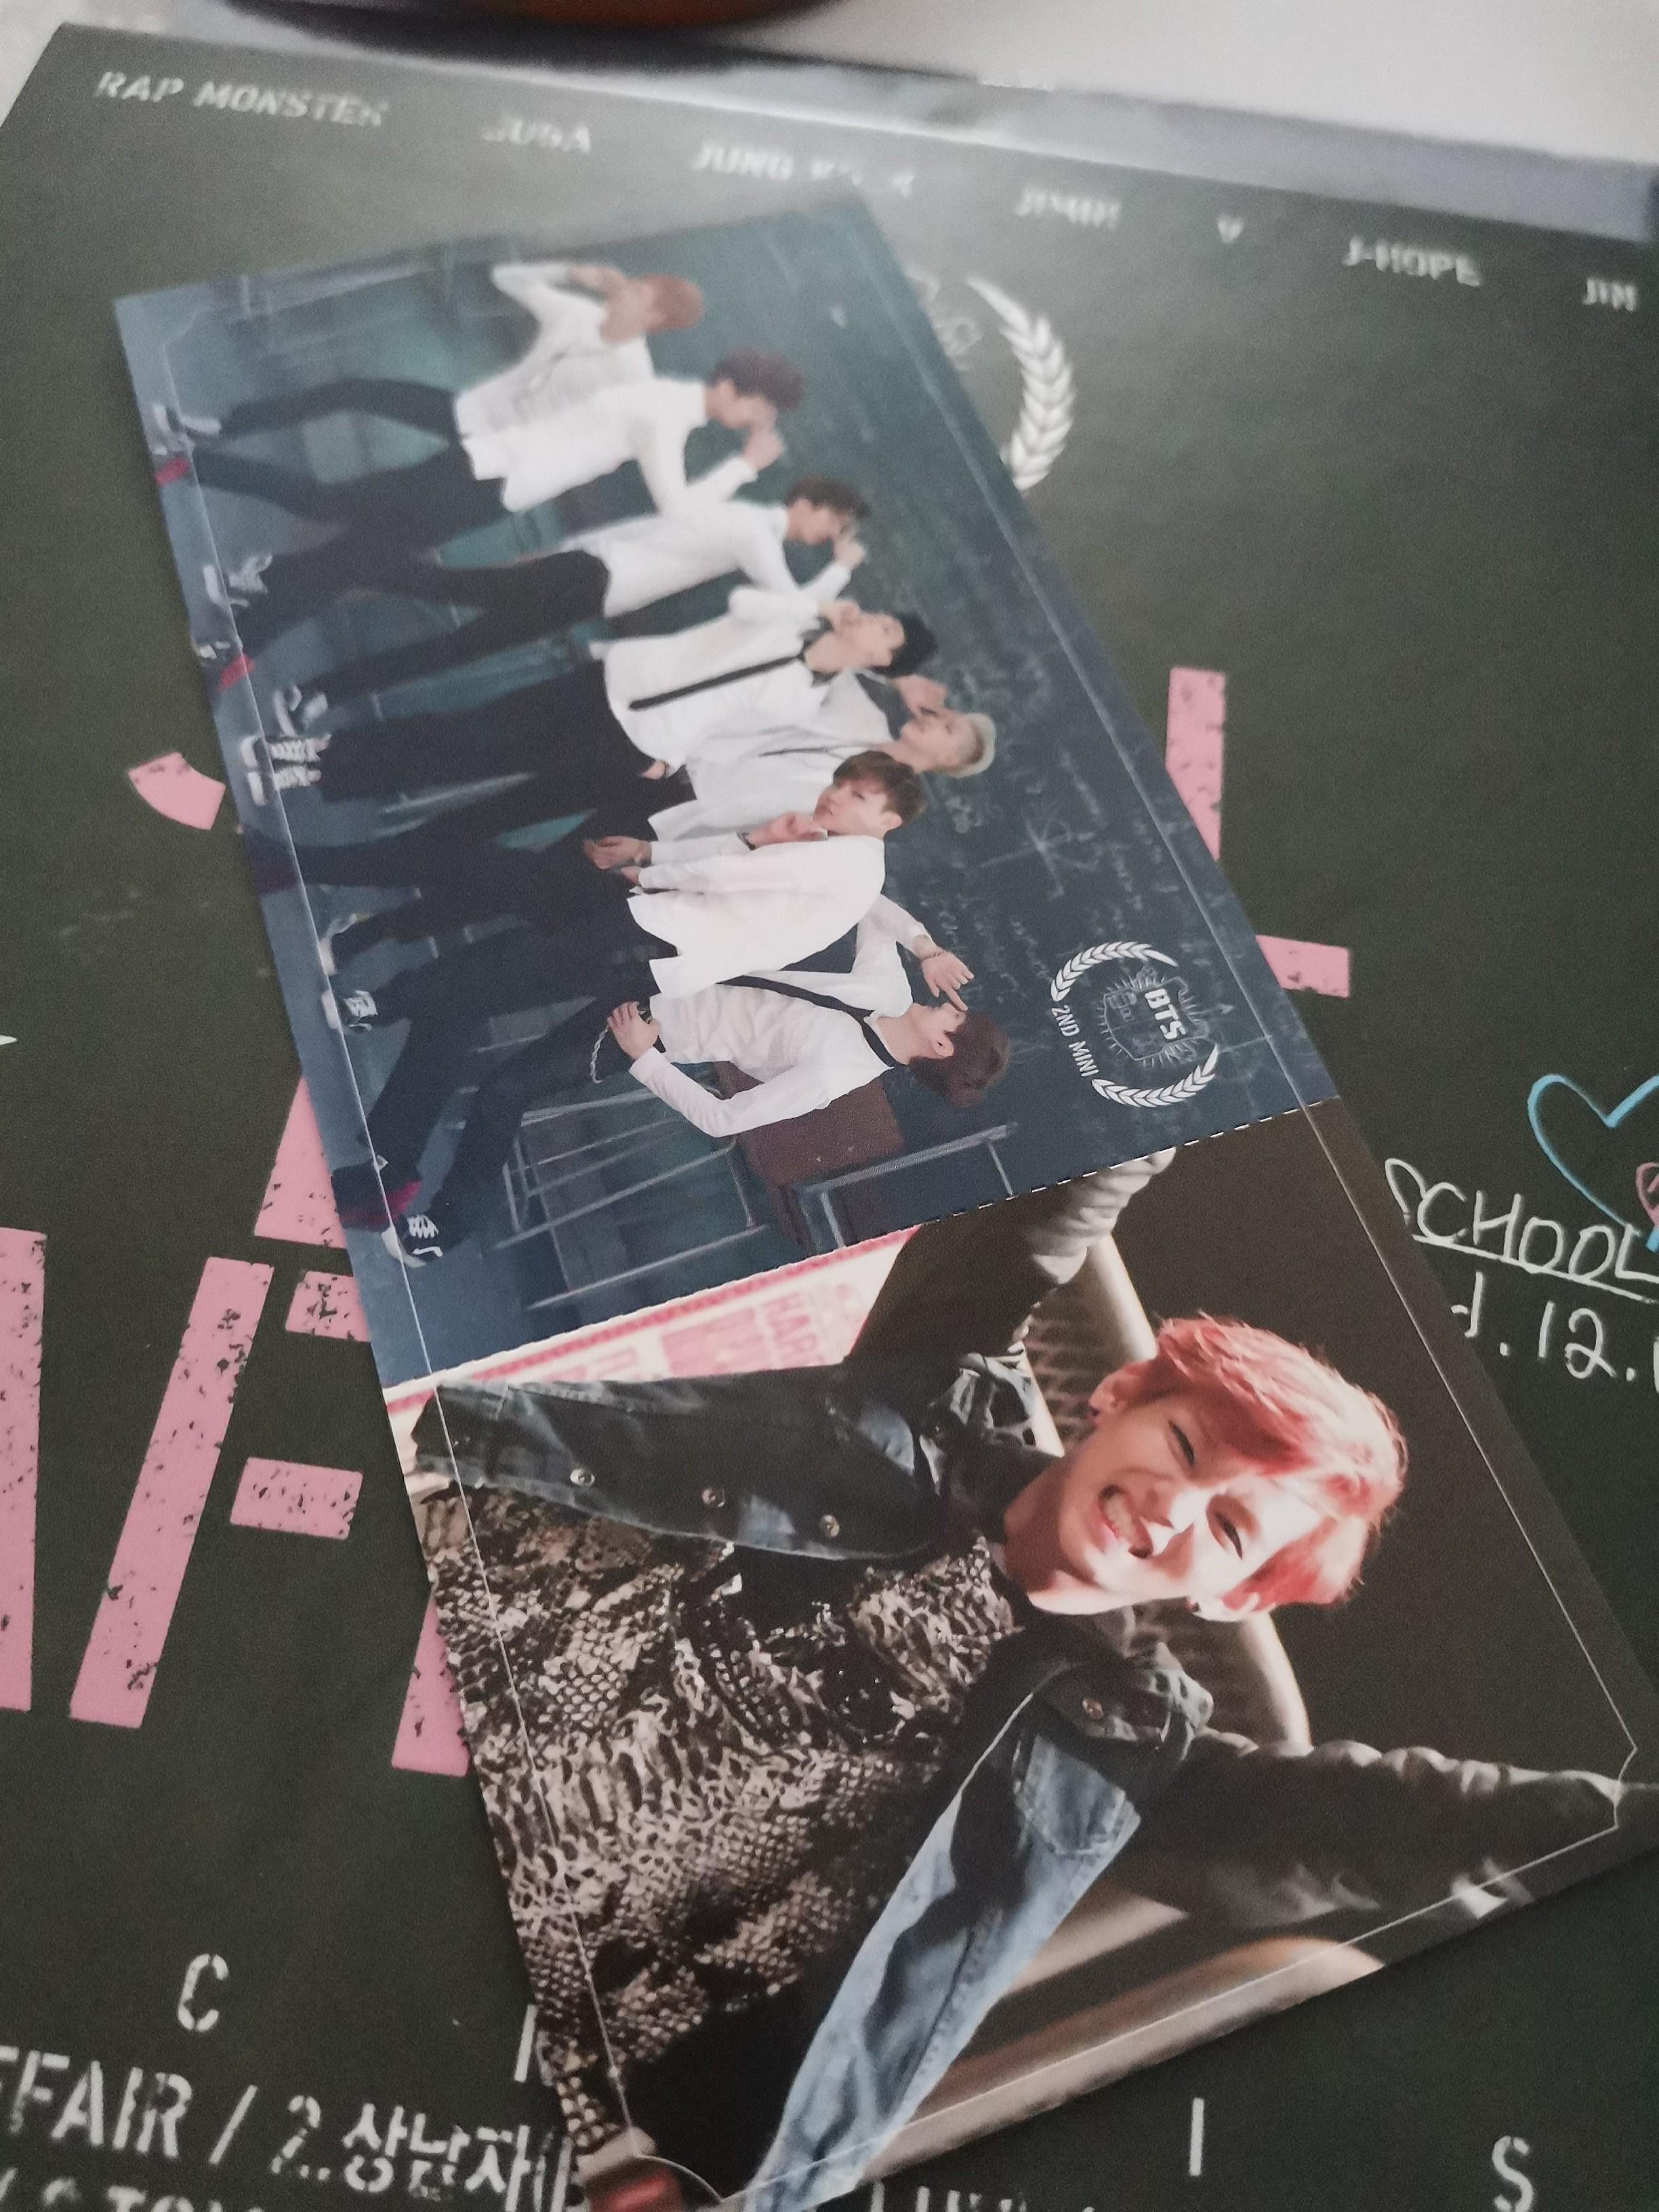 (WTT ONLY) Skool Luv Affair Taehyung V pc Photocard